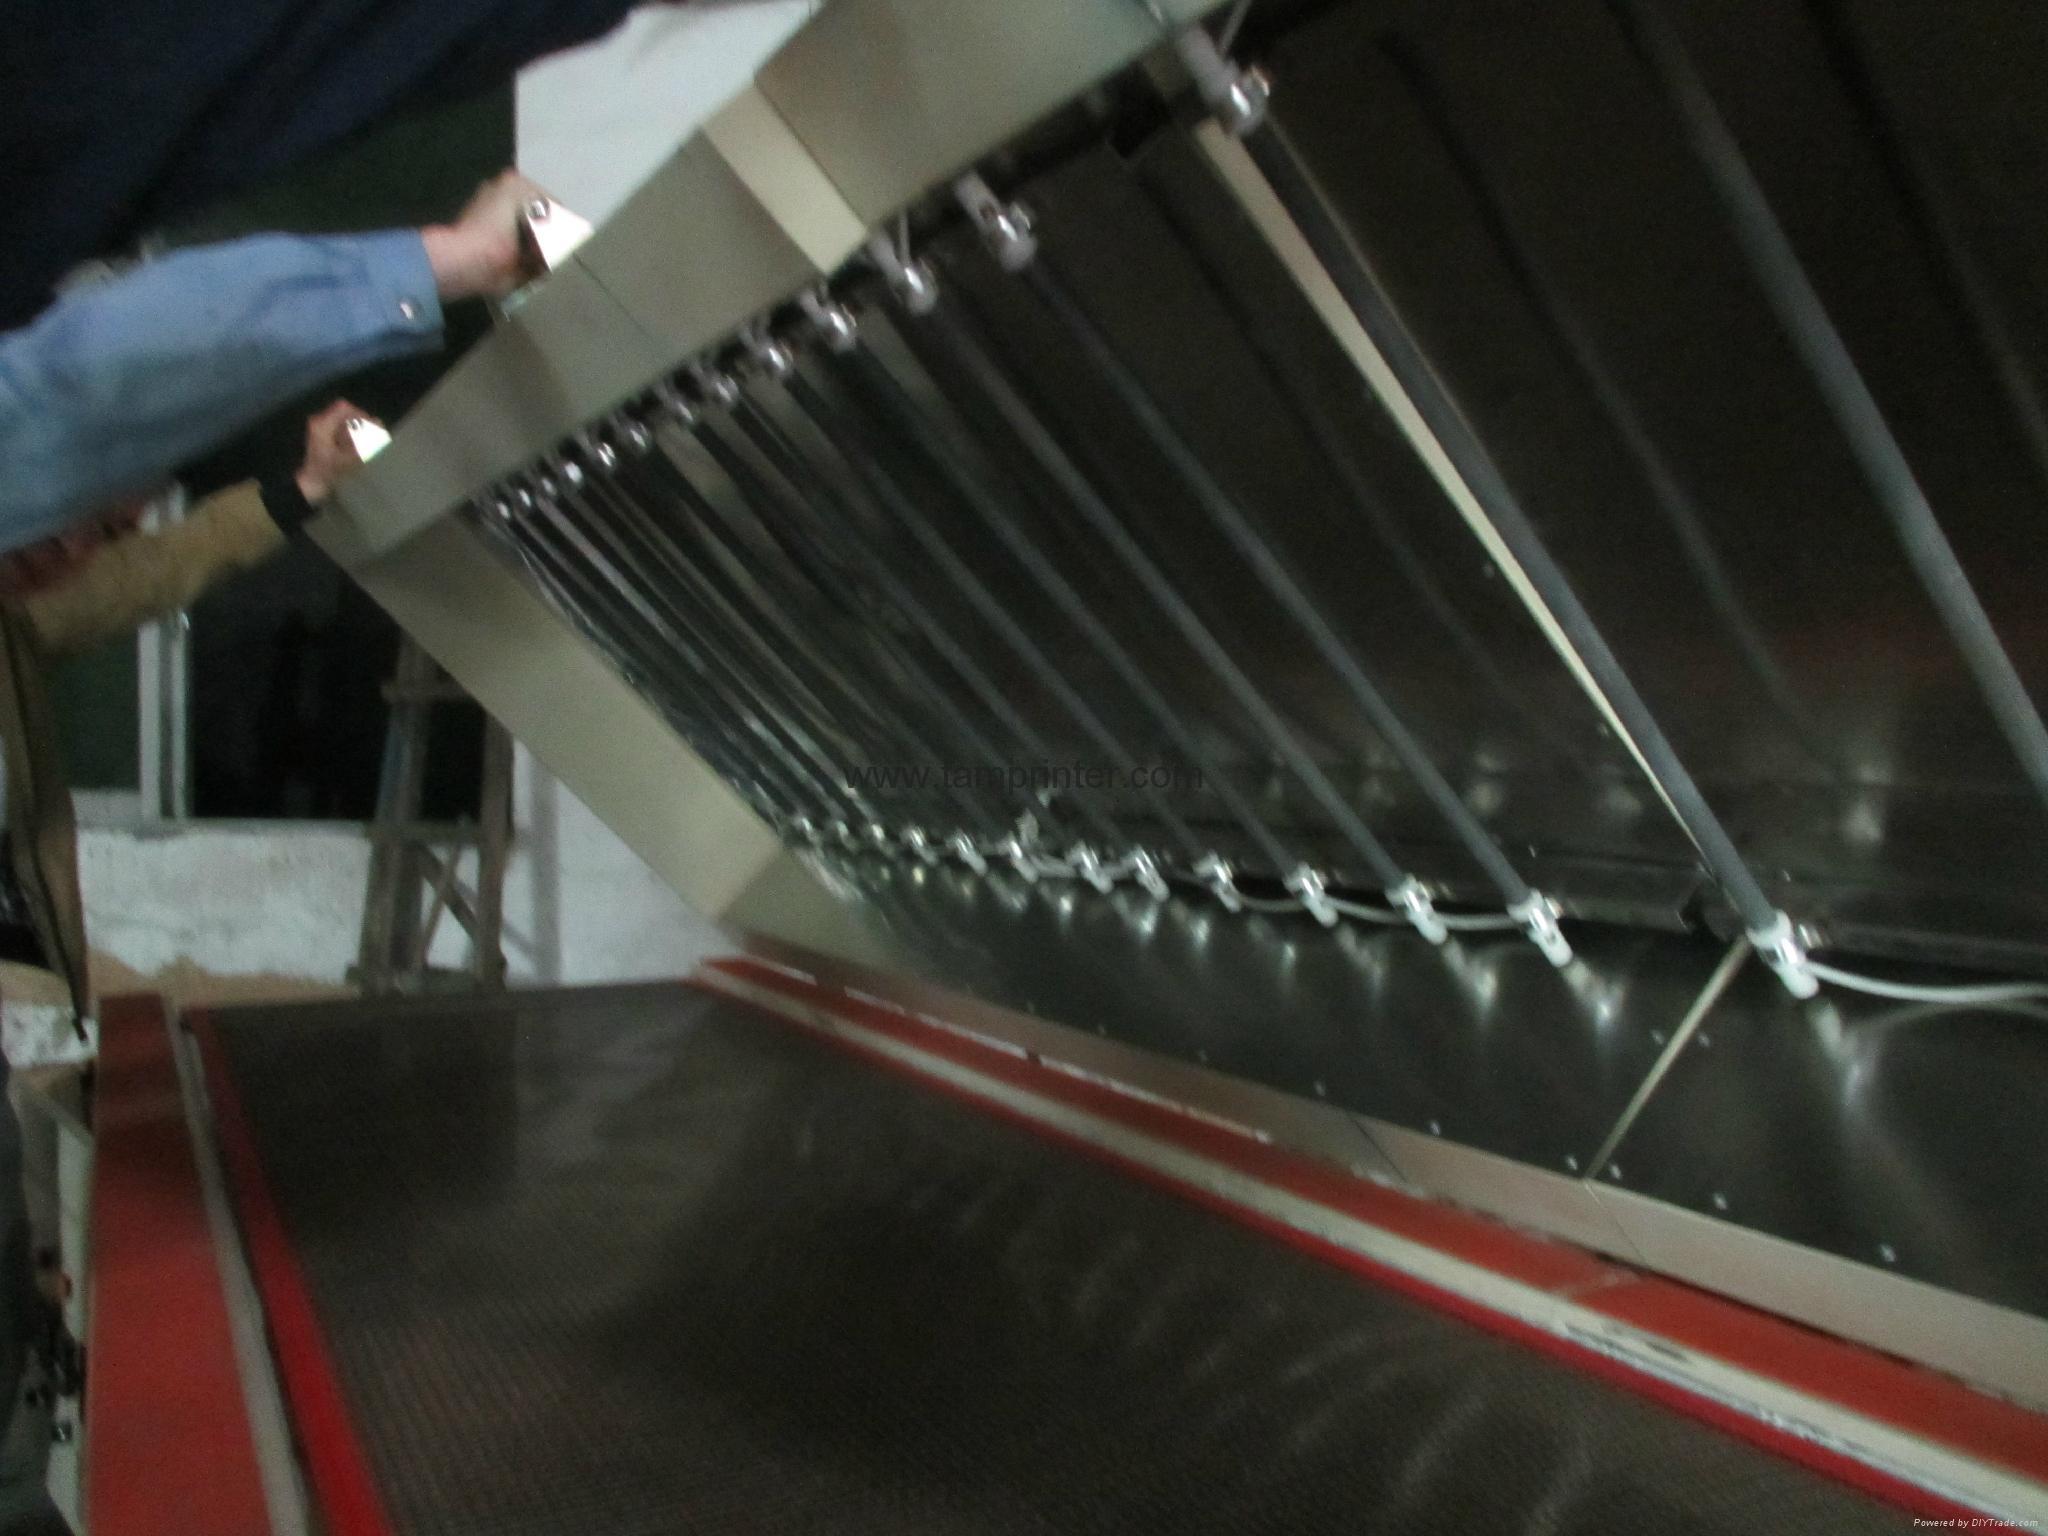 T-shirts Drying tunnel equipment